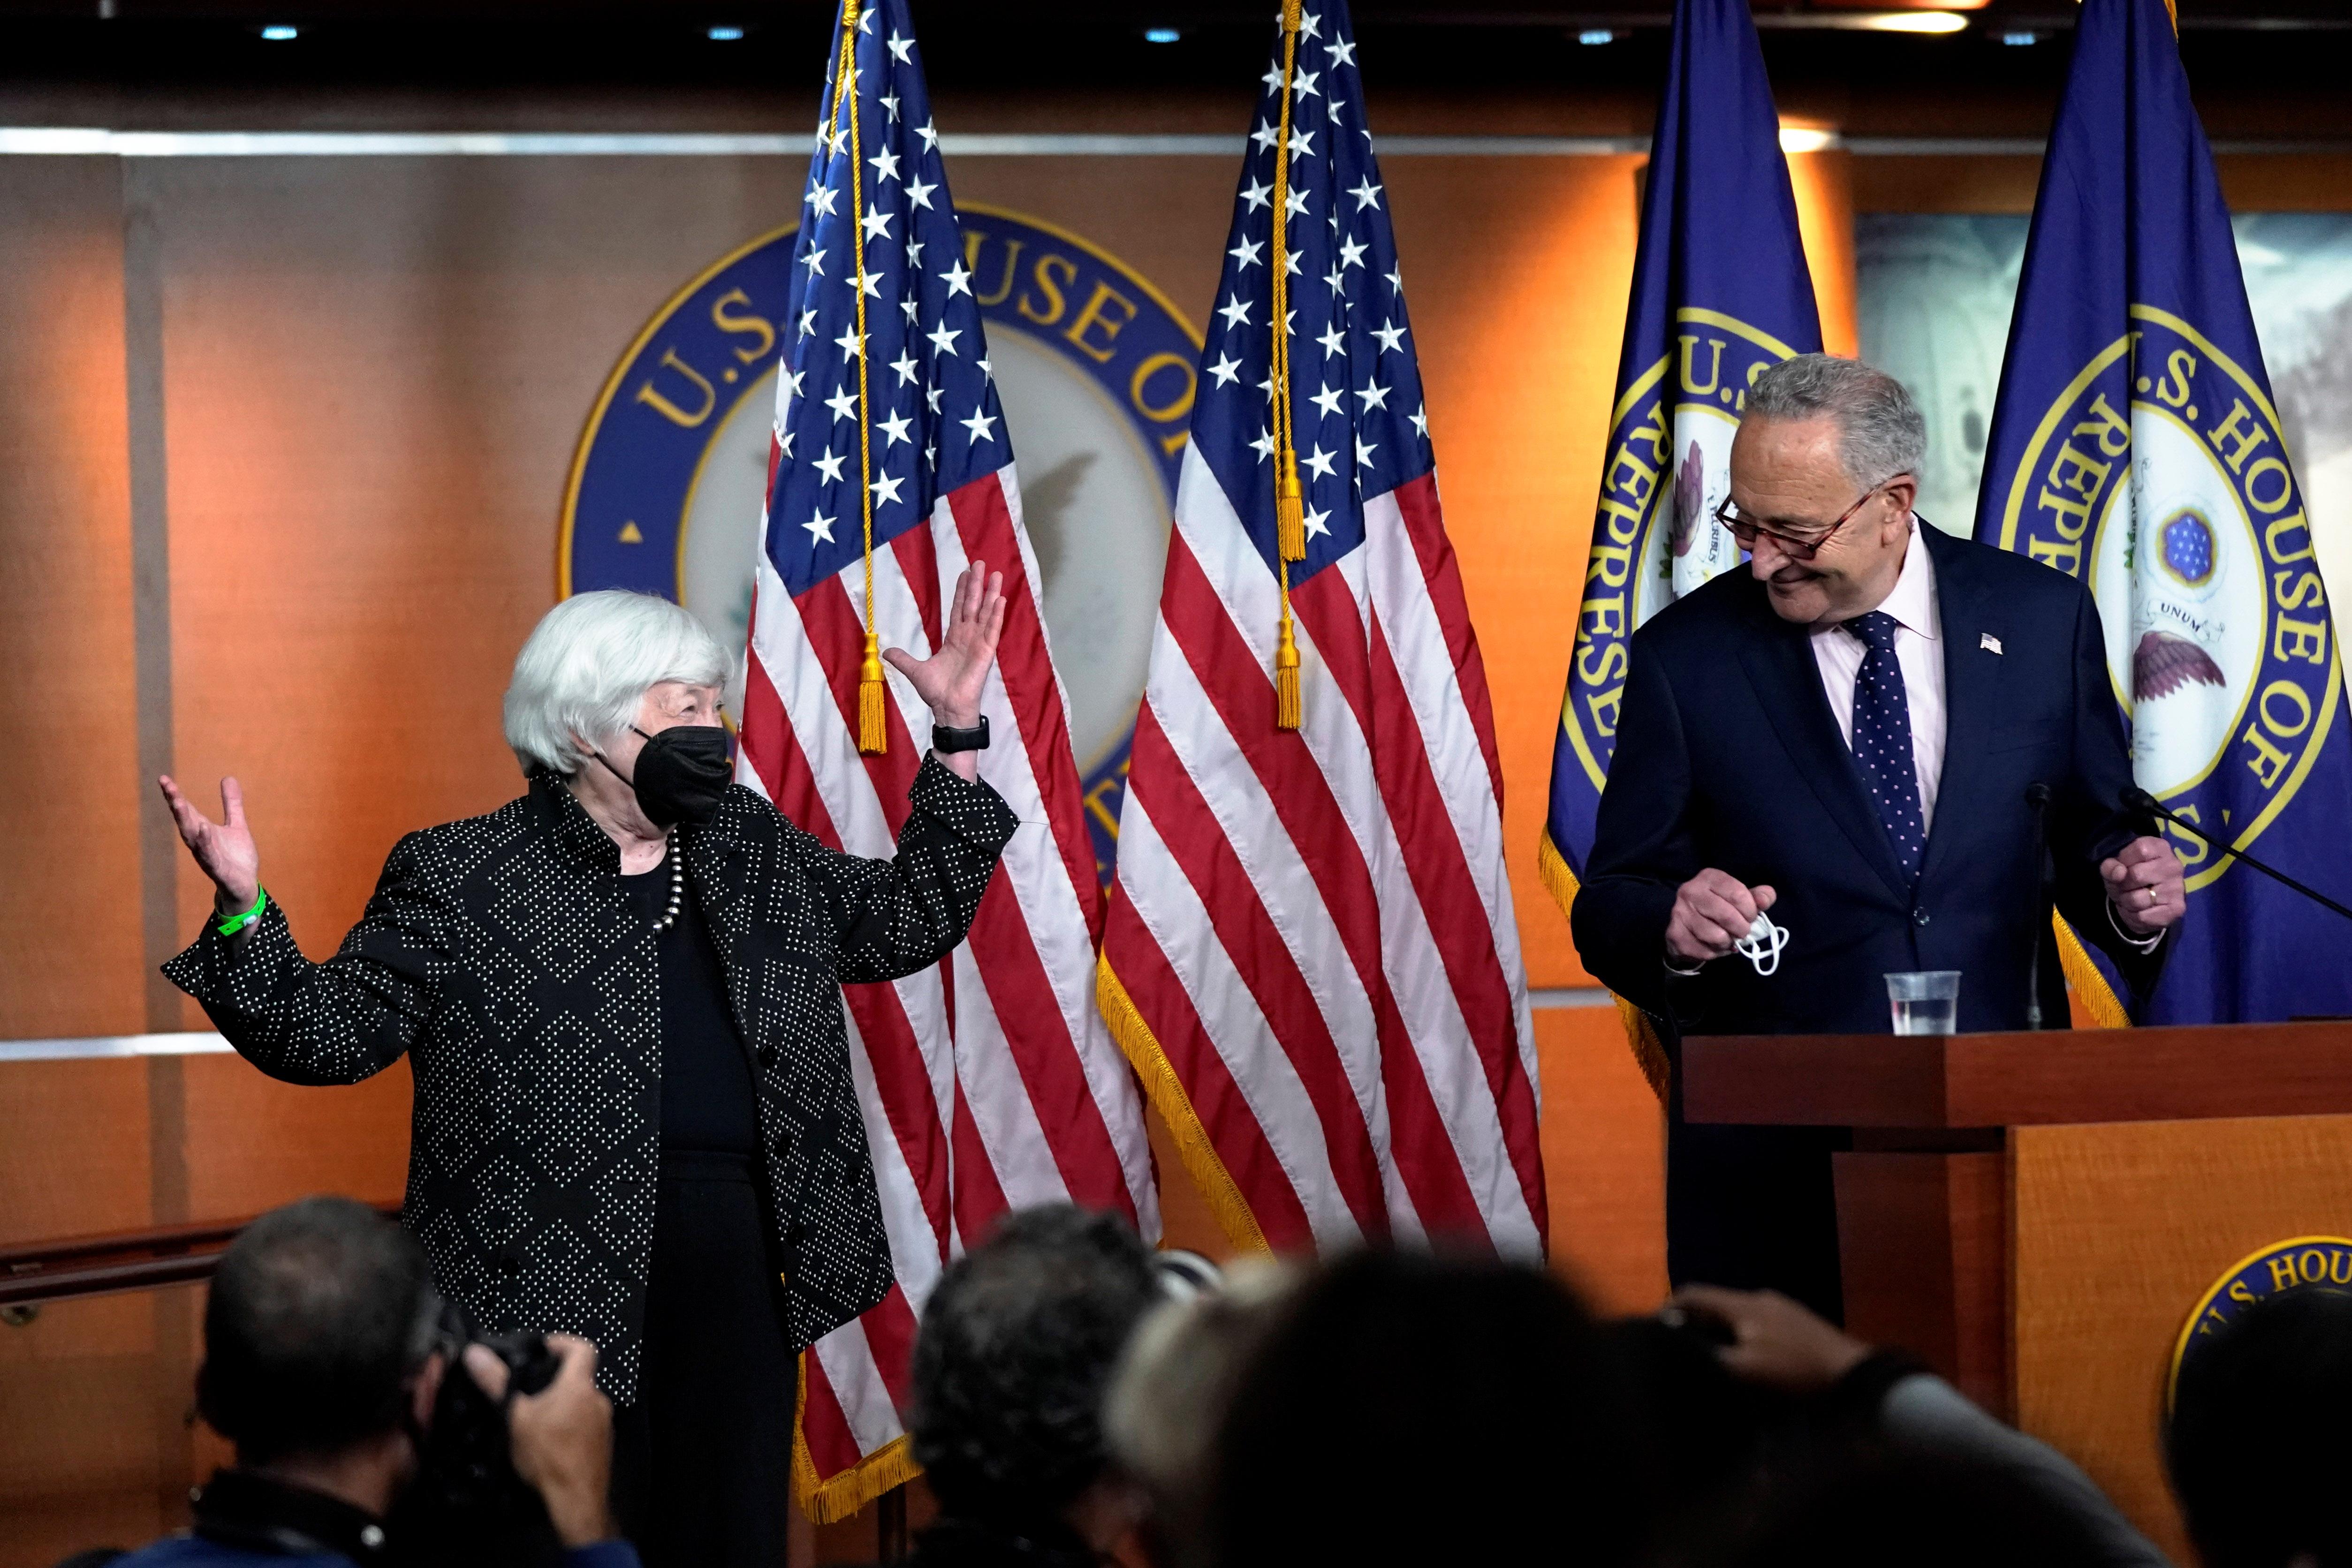 Treasury Secretary Janet Yellen gestures as Senate Majority Leader Chuck Schumer makes a brief statement before the start of House Speaker Nancy Pelosi's weekly news conference on Capitol Hill in Washington, U.S., September 23, 2021. REUTERS/Elizabeth Frantz